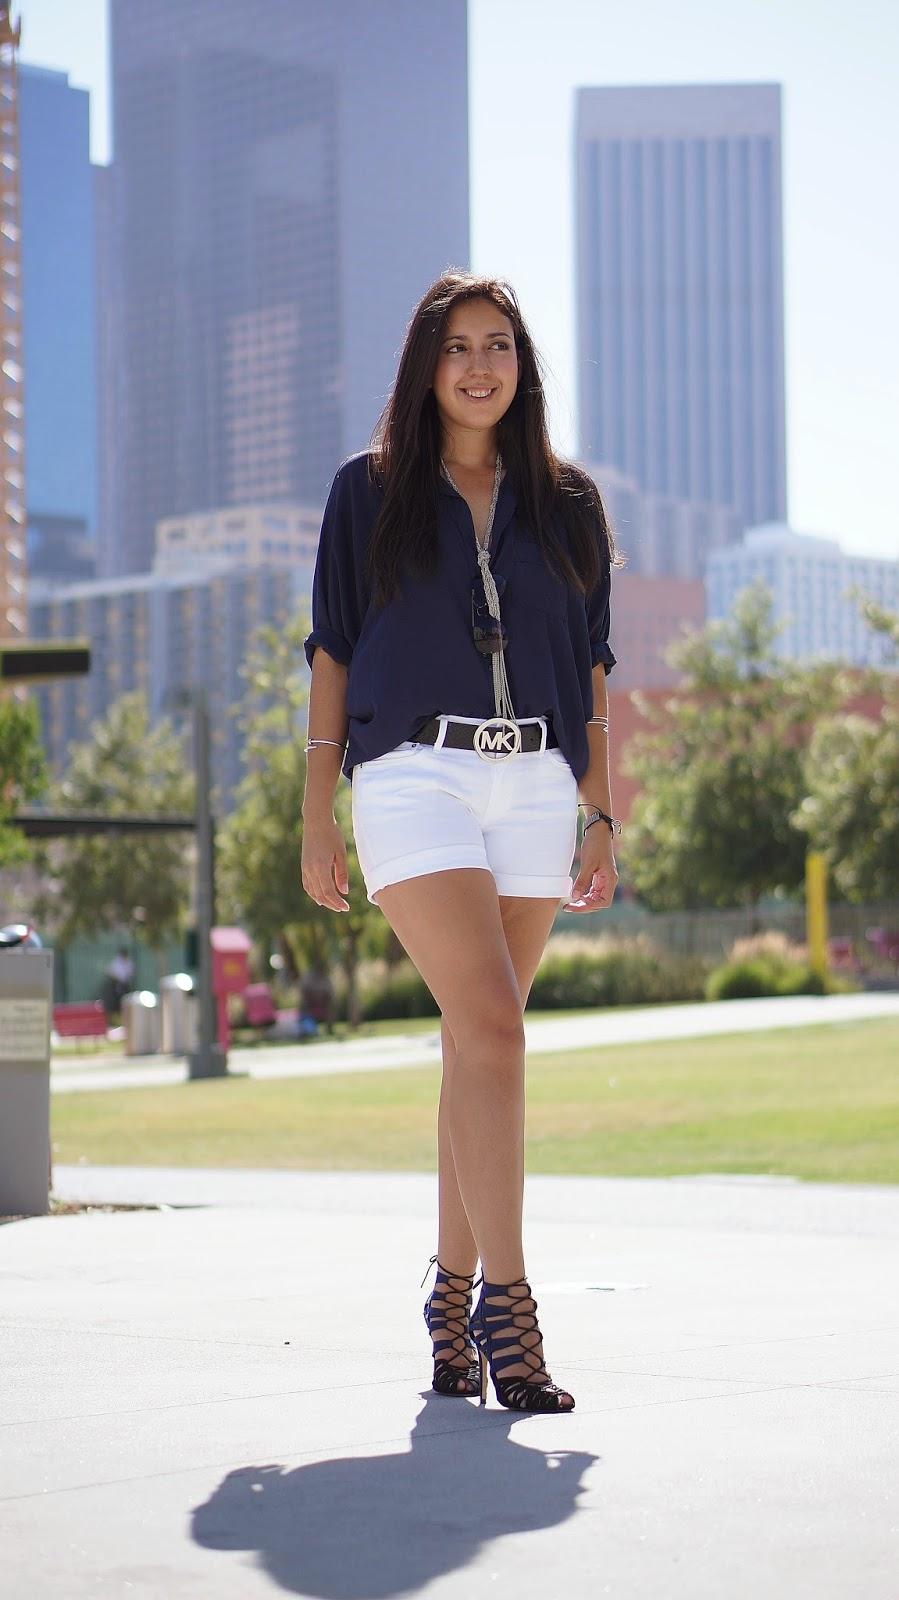 Levi's Roll Cuff White Shorts, Summer Fashion, Fashion Blogger, Zara Heels, Casual Look